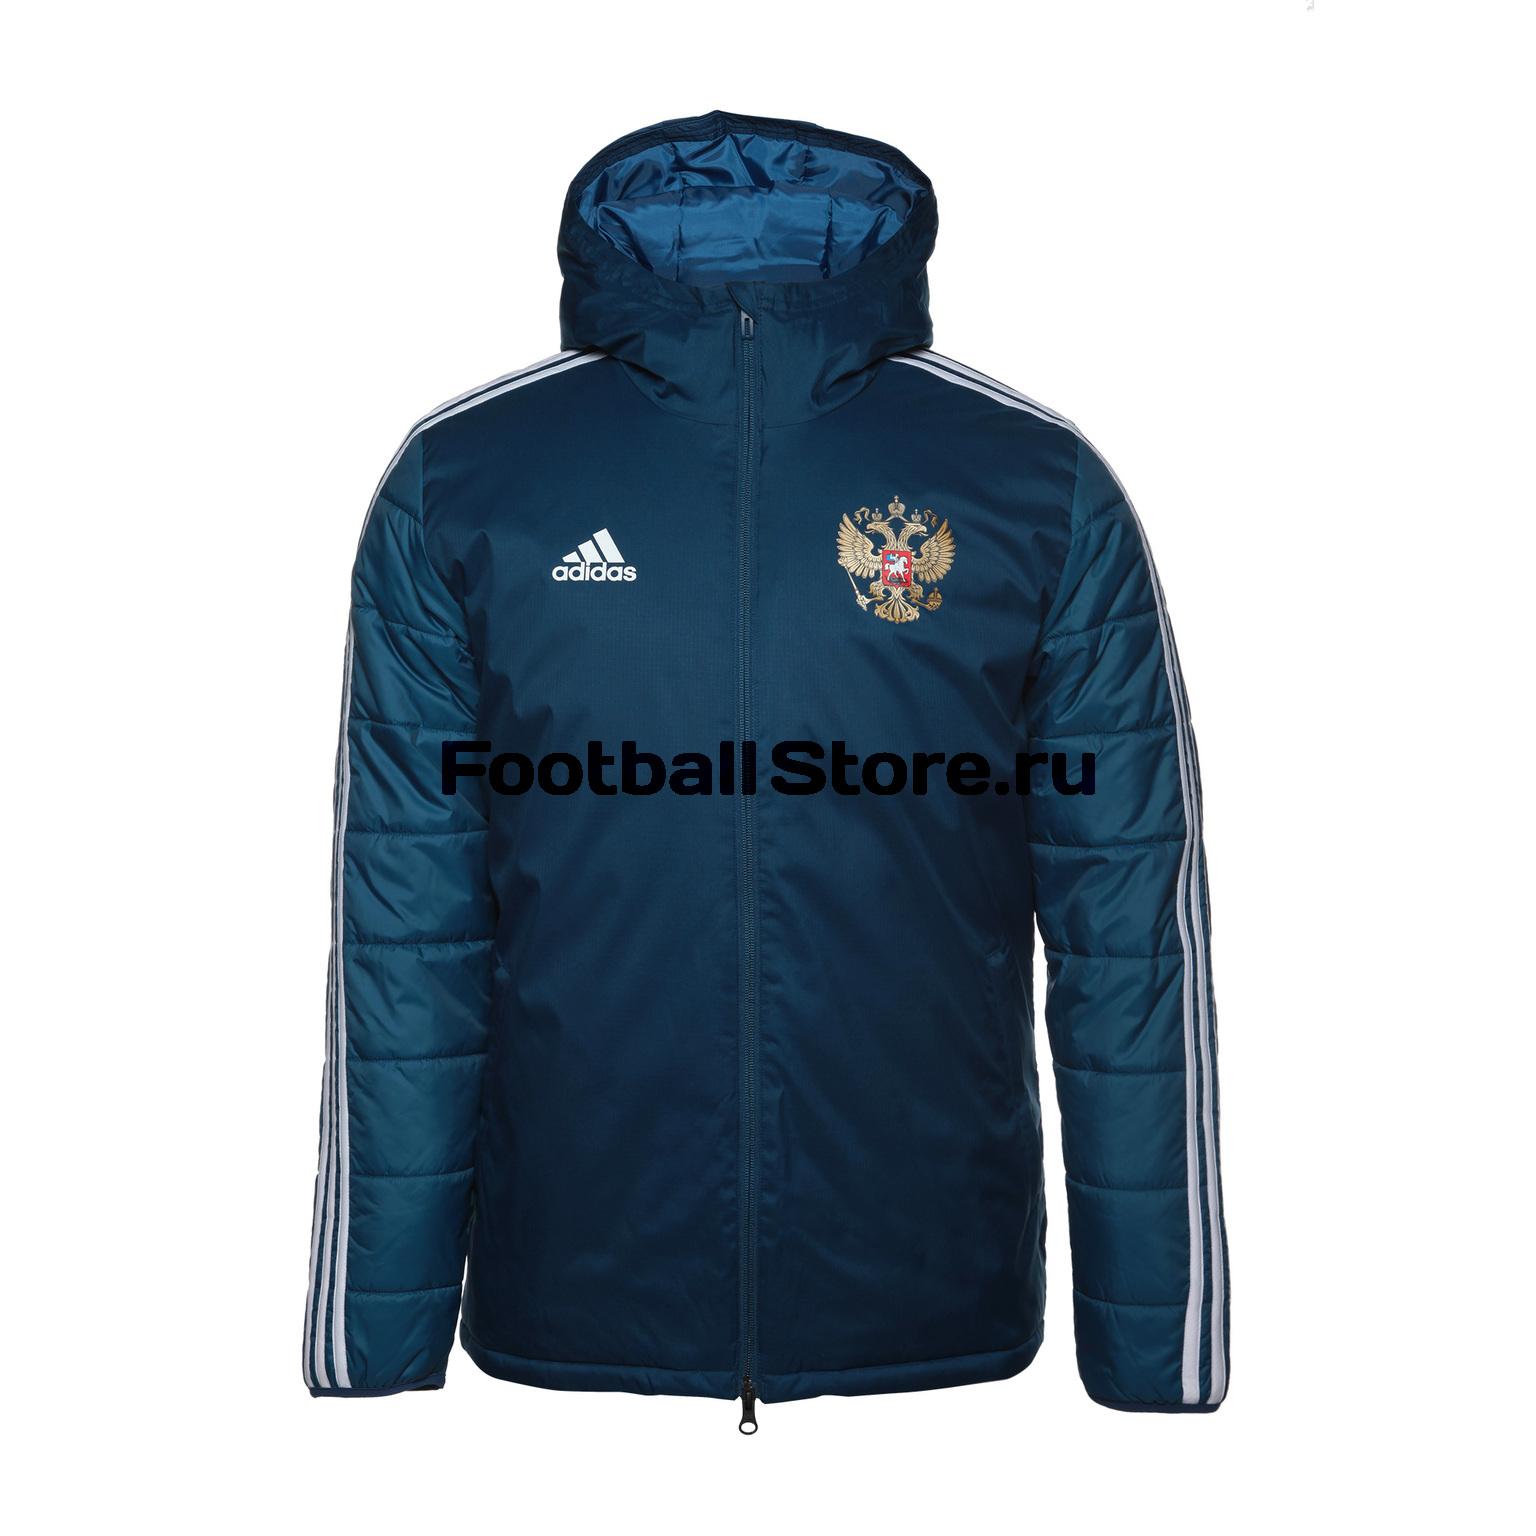 Куртка утепленная Adidas Russia Winter JKT CE8787 куртки пуховики adidas куртка утепленная adidas con 16 std jkt ab3150